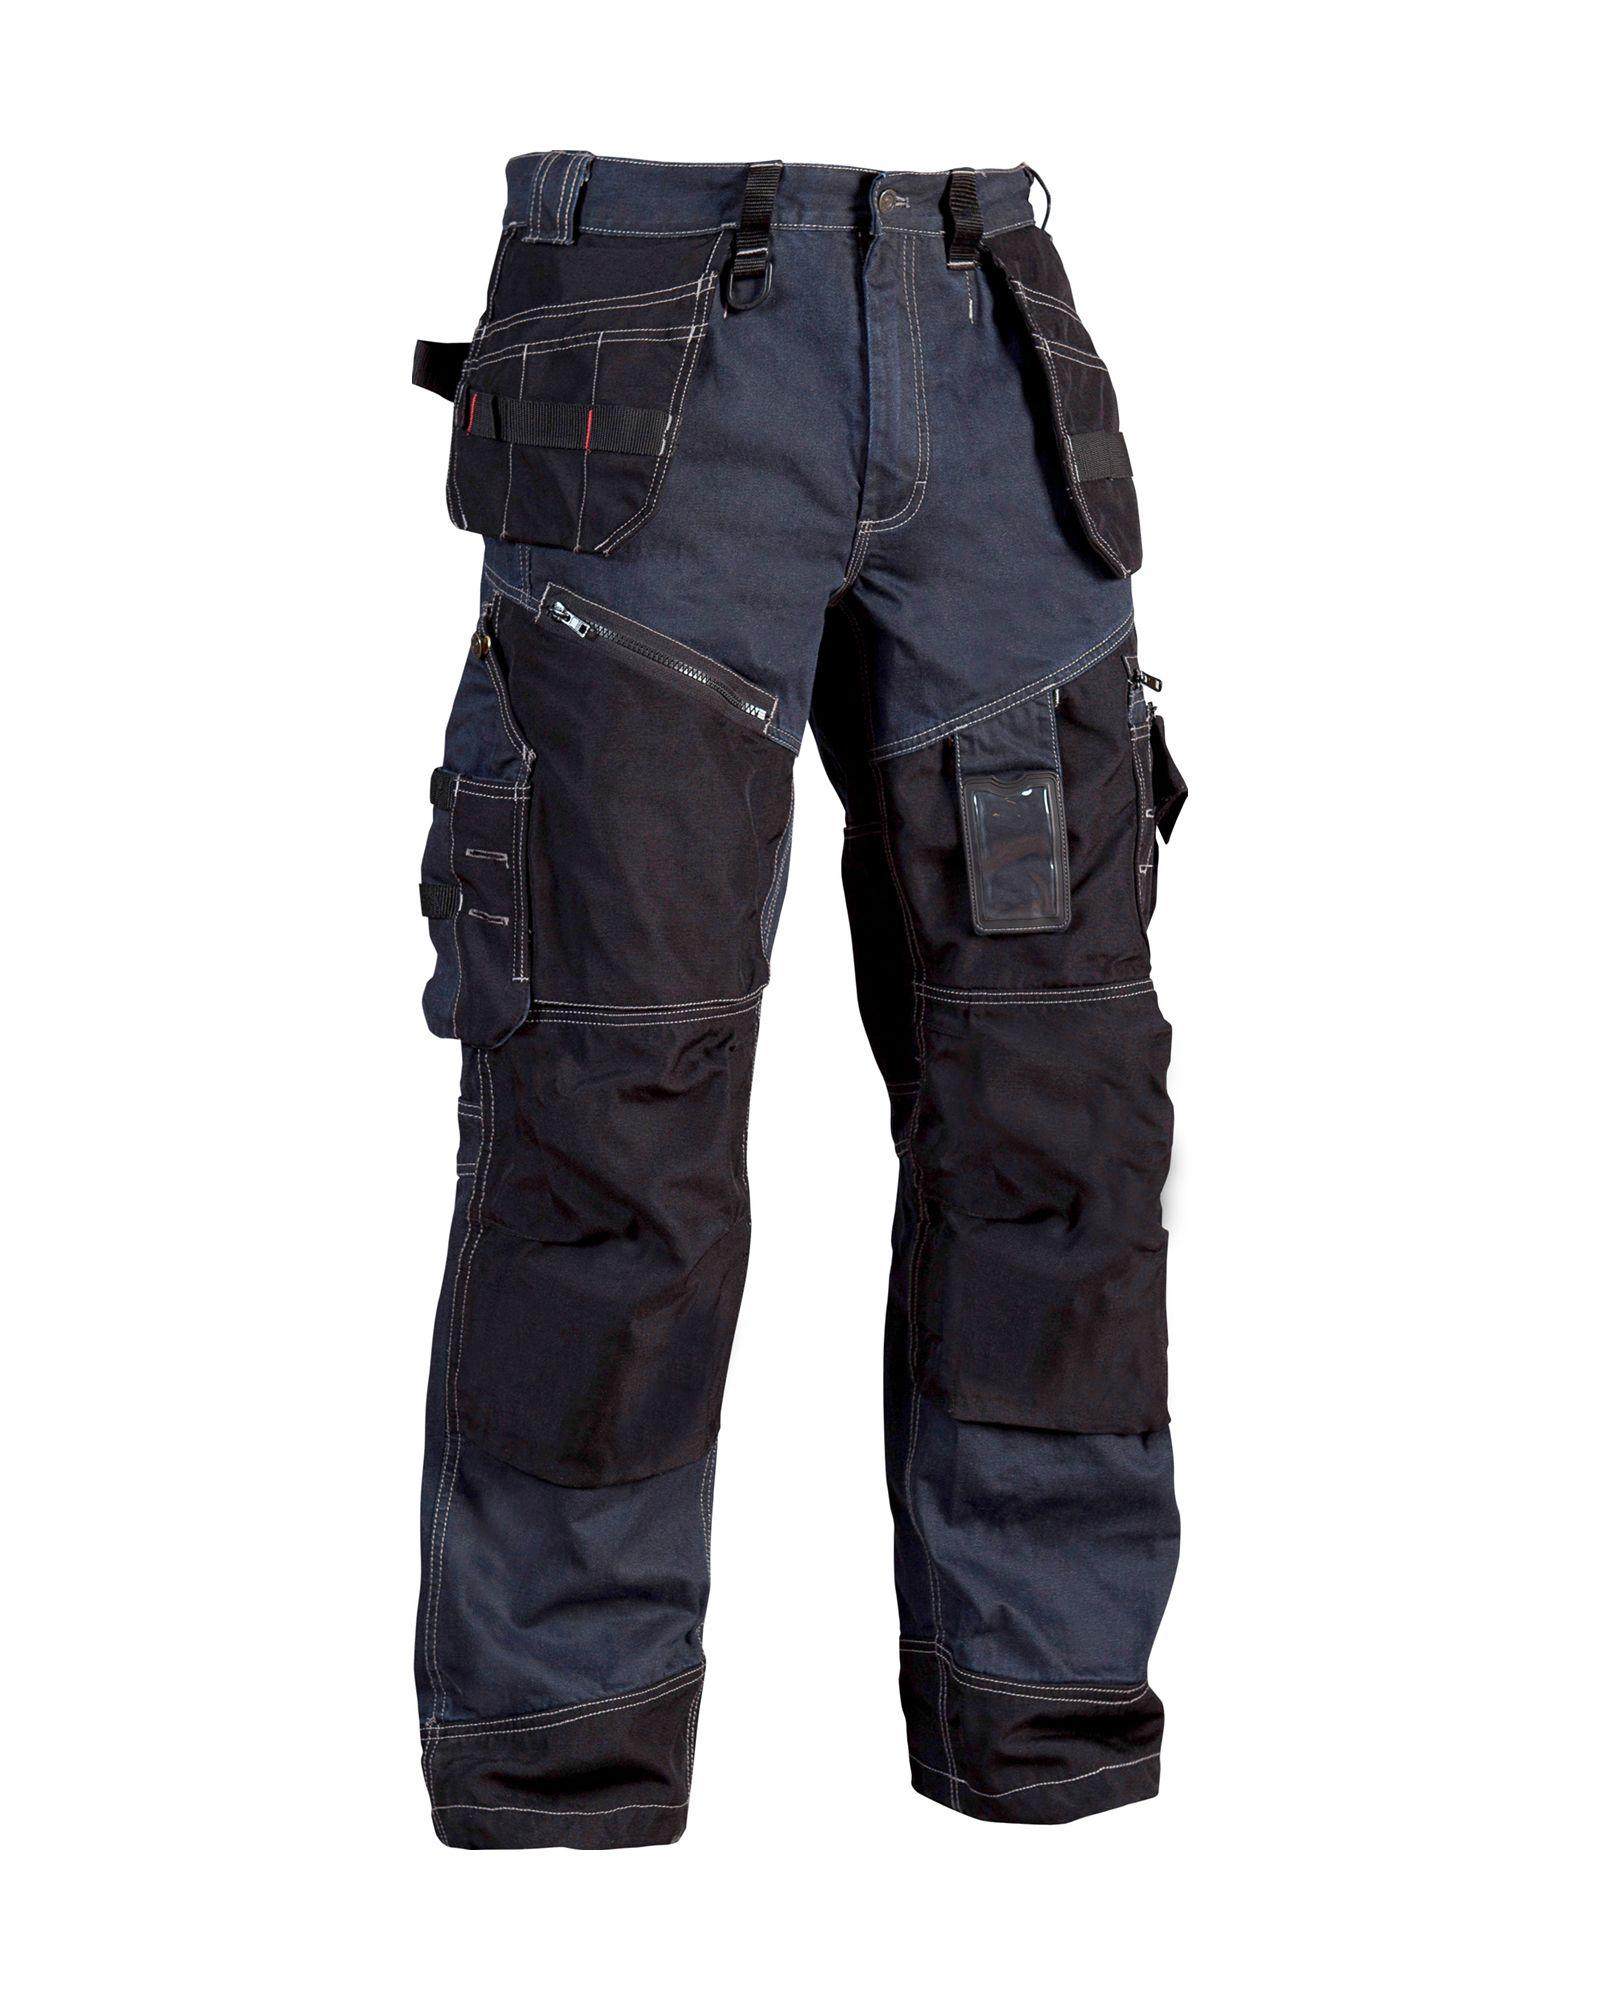 e575b5a7f8 Blåkläder - 150011408999 Bundhose Handwerker X1500 | Pants | Work ...